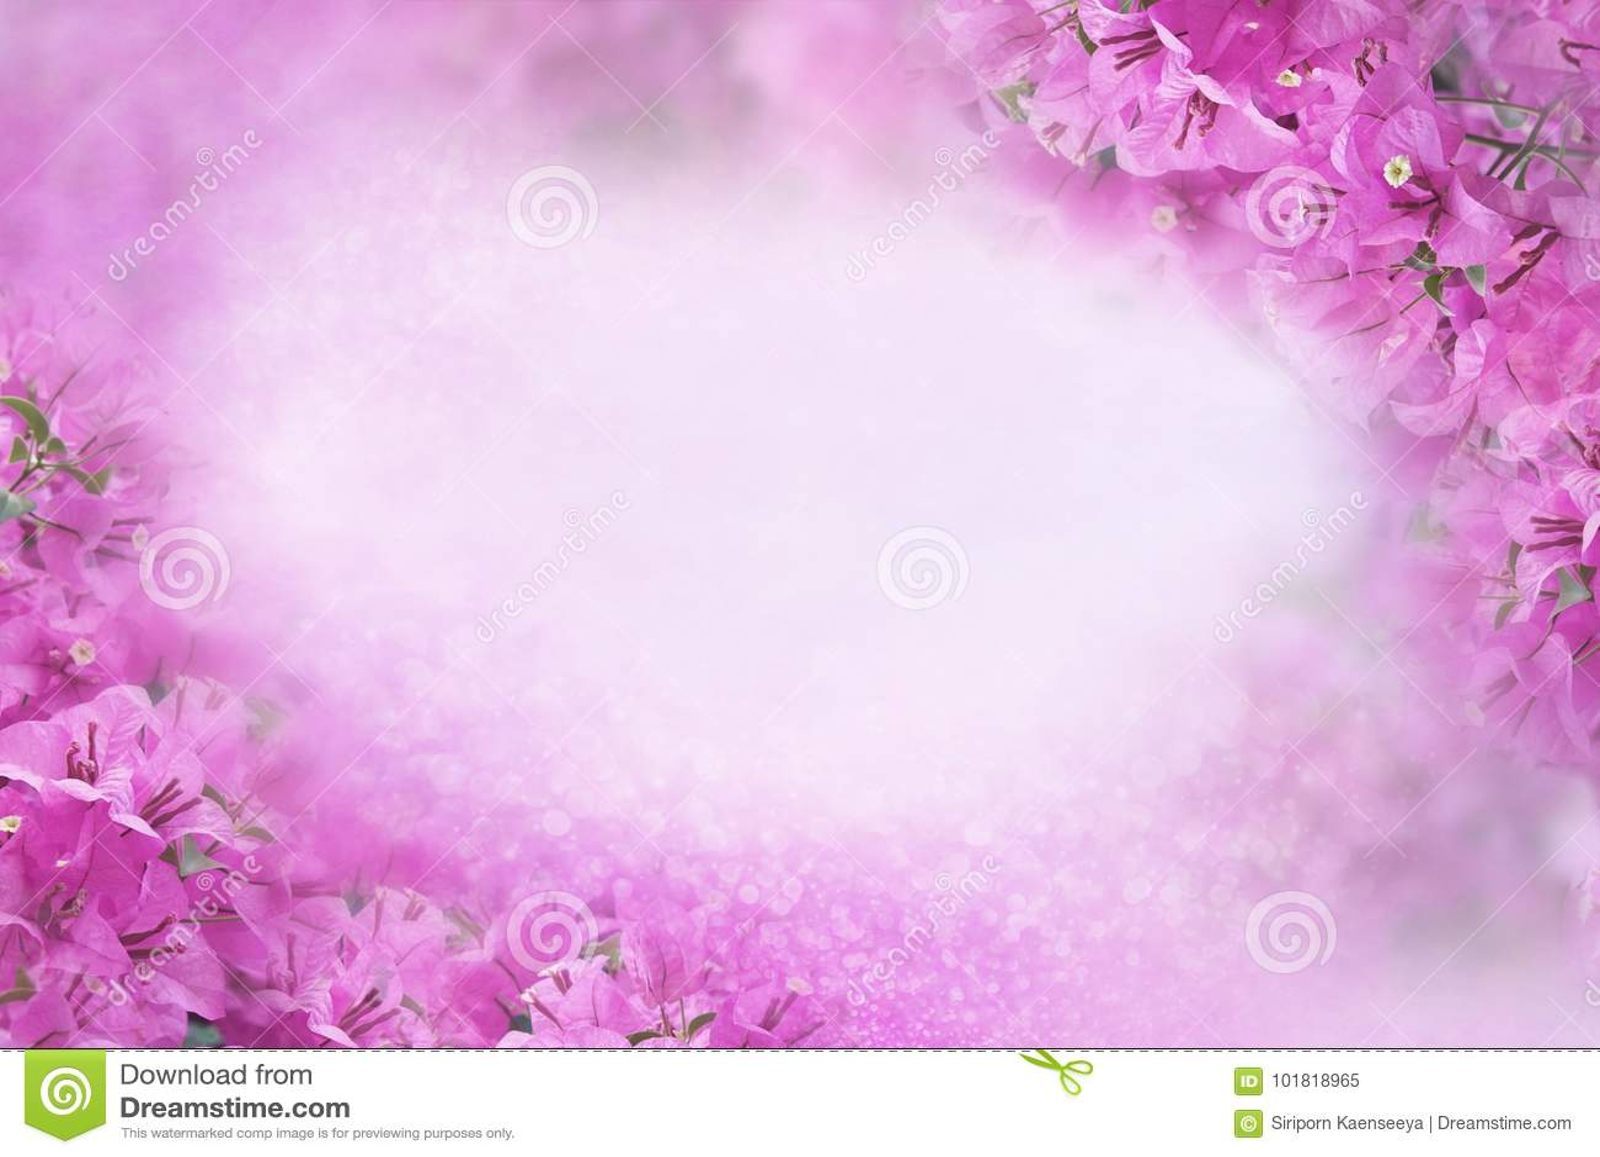 El Marco Púrpura De La Buganvilla De La Flor En Fondo Púrpura Dulce ...